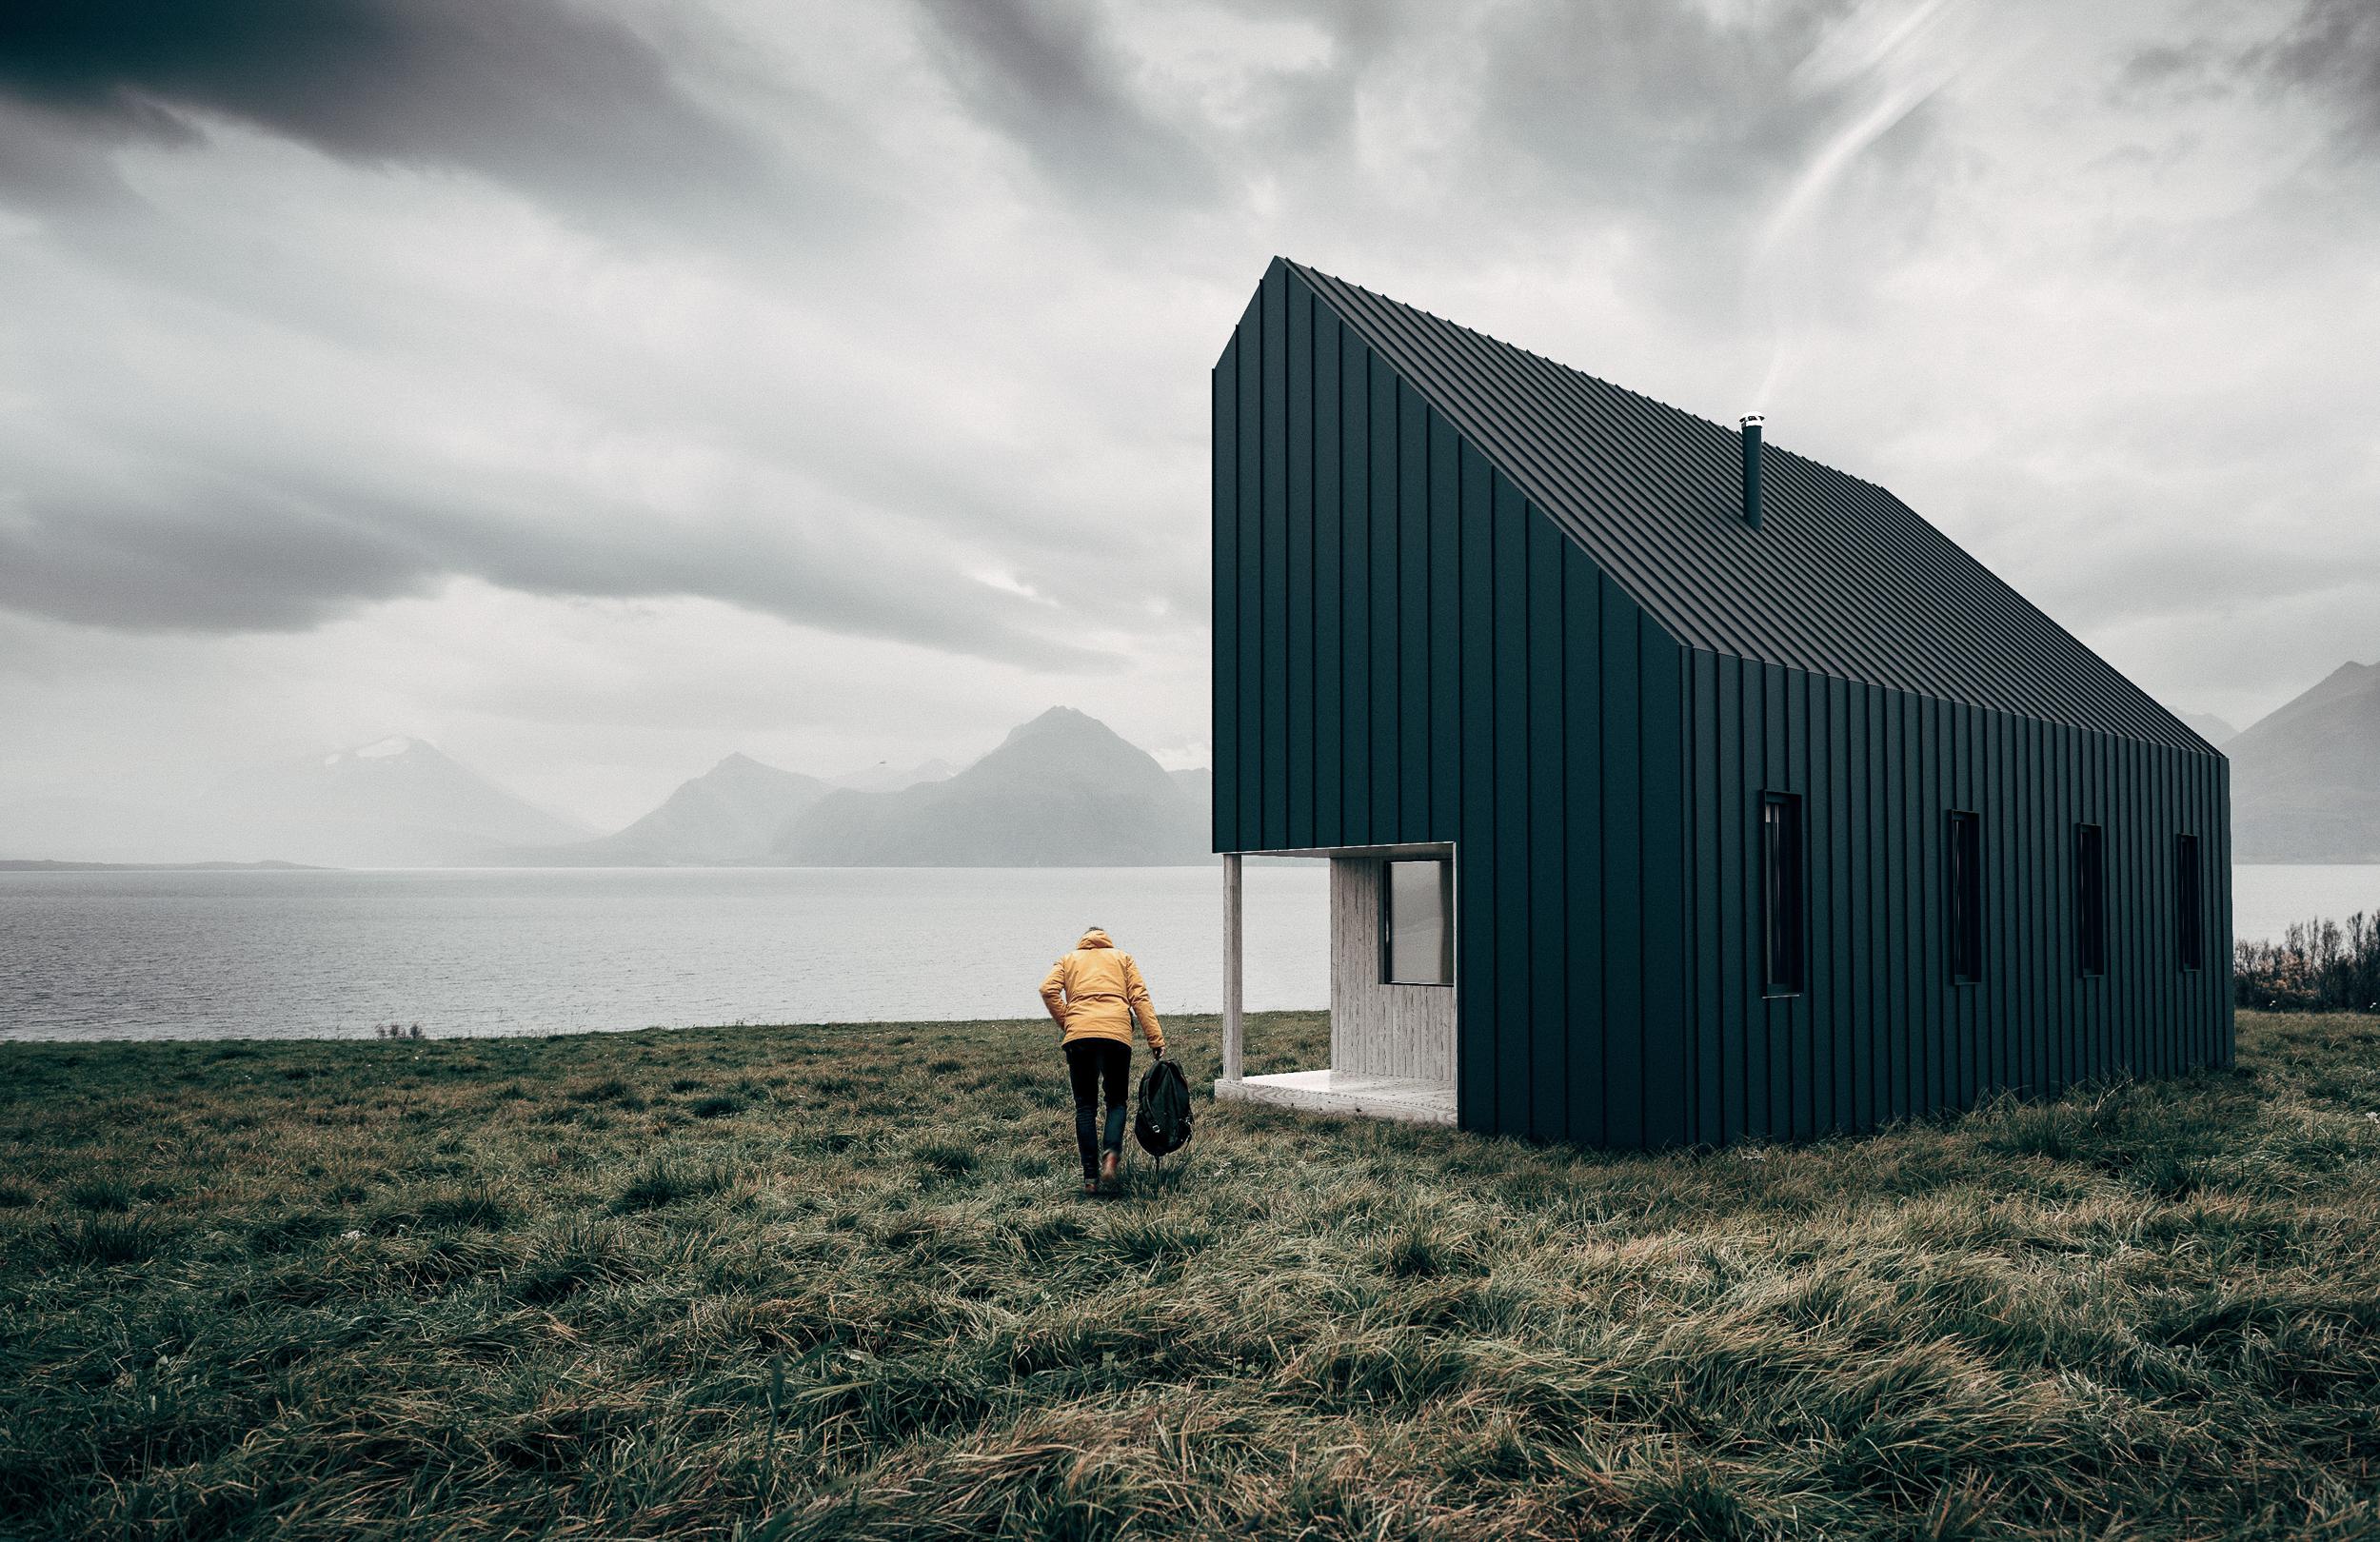 Backcountry Hut Company prefab modular home building kit